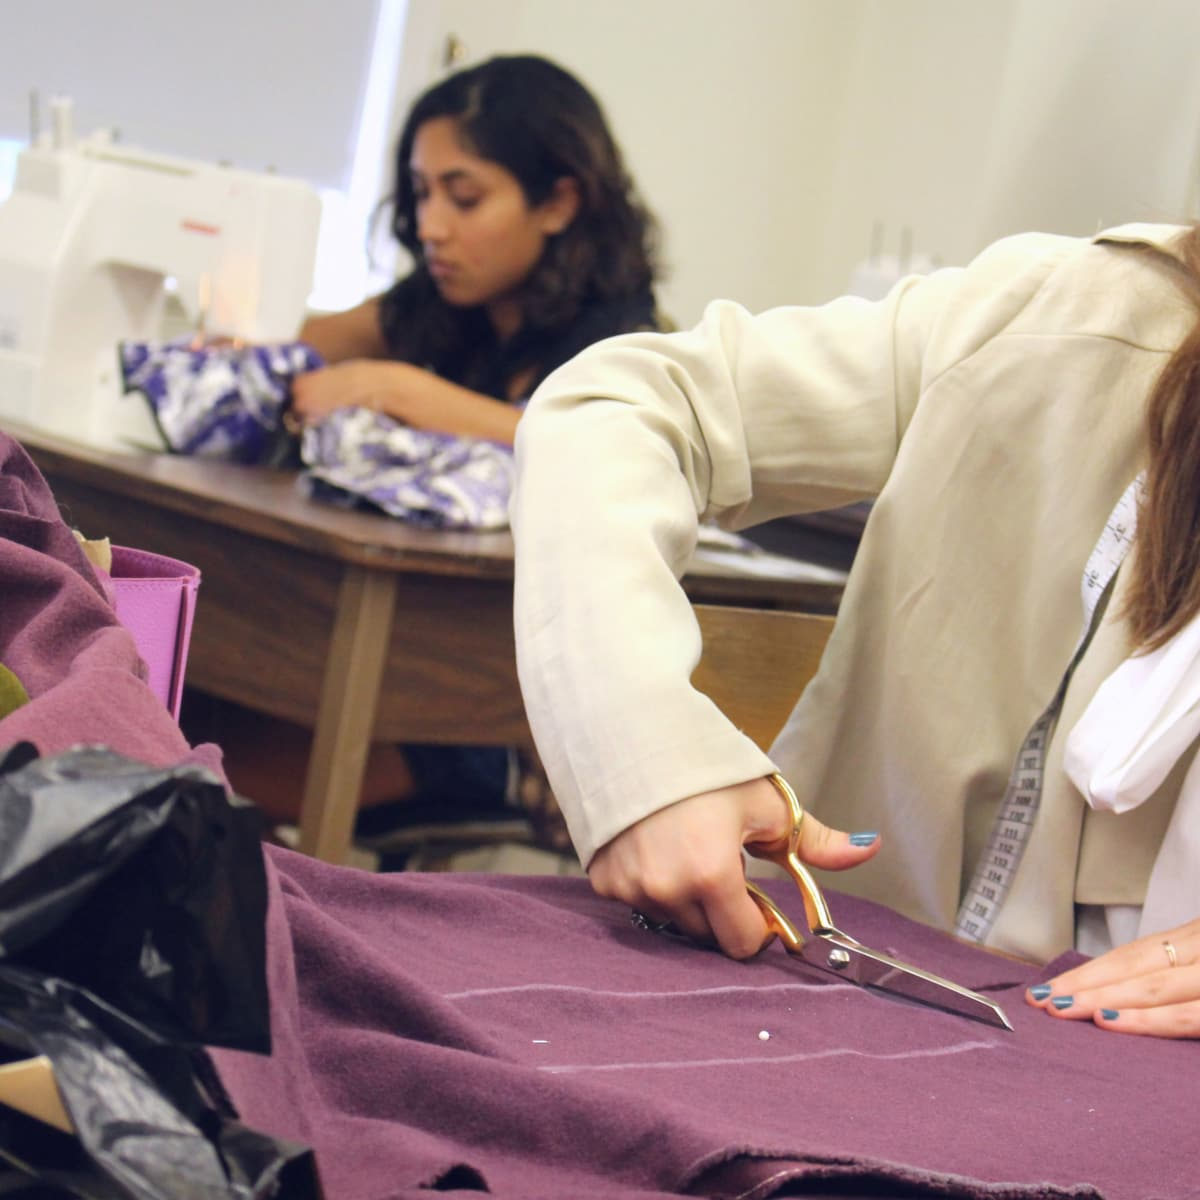 University of Texas fashion show Elements preview class April 2016 Avani Patel Taylor Litman